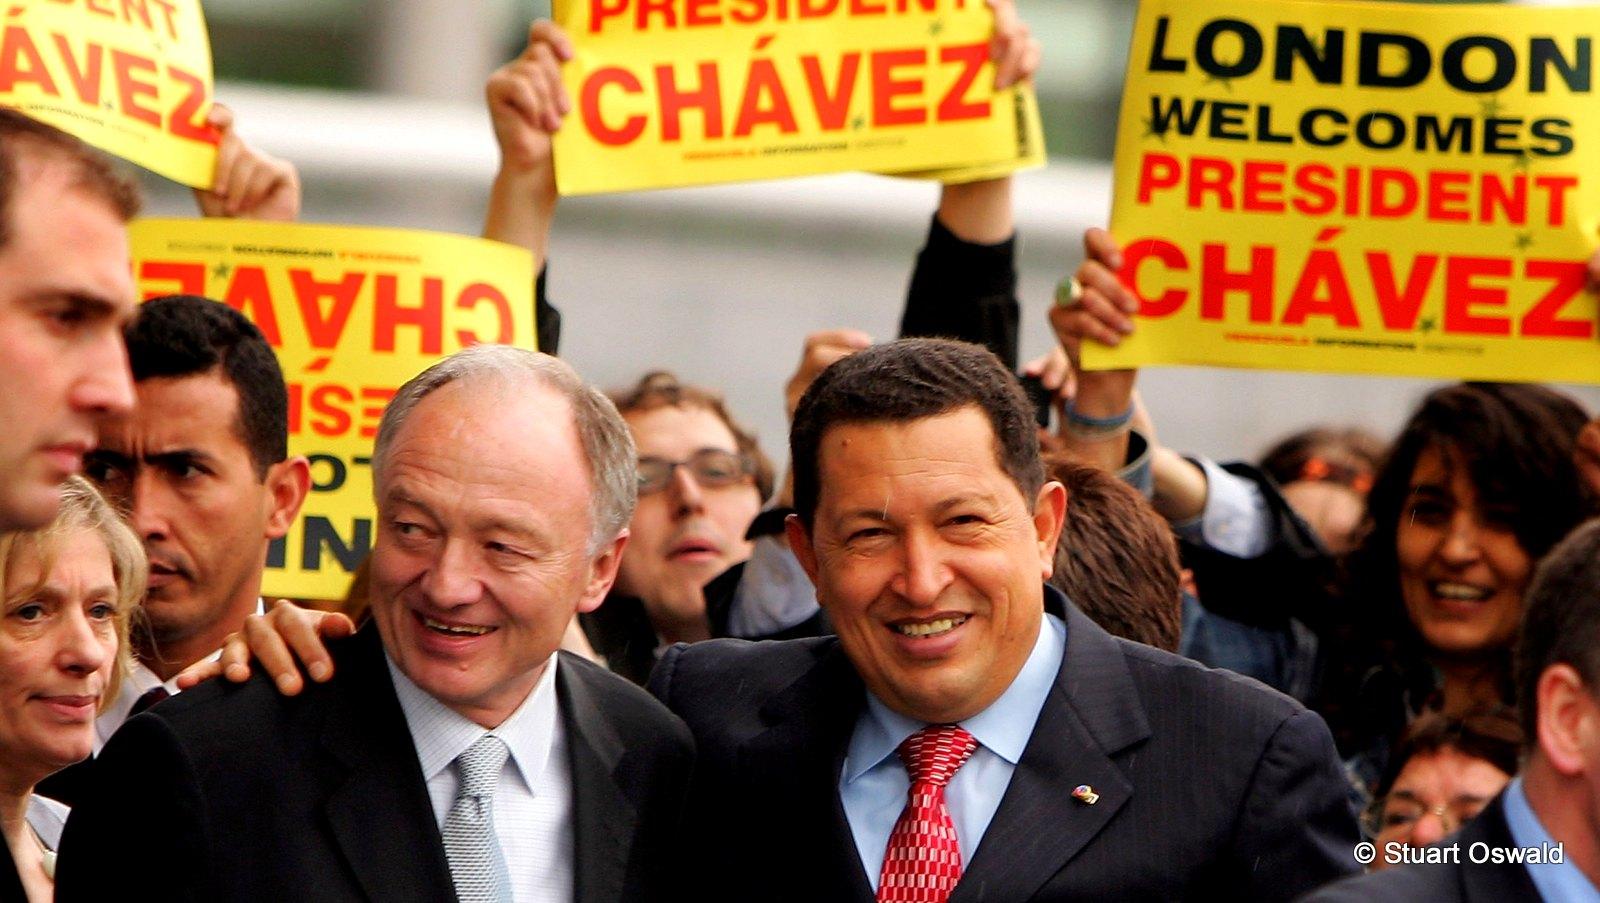 Hugo Chavez - The Death of a Dictator